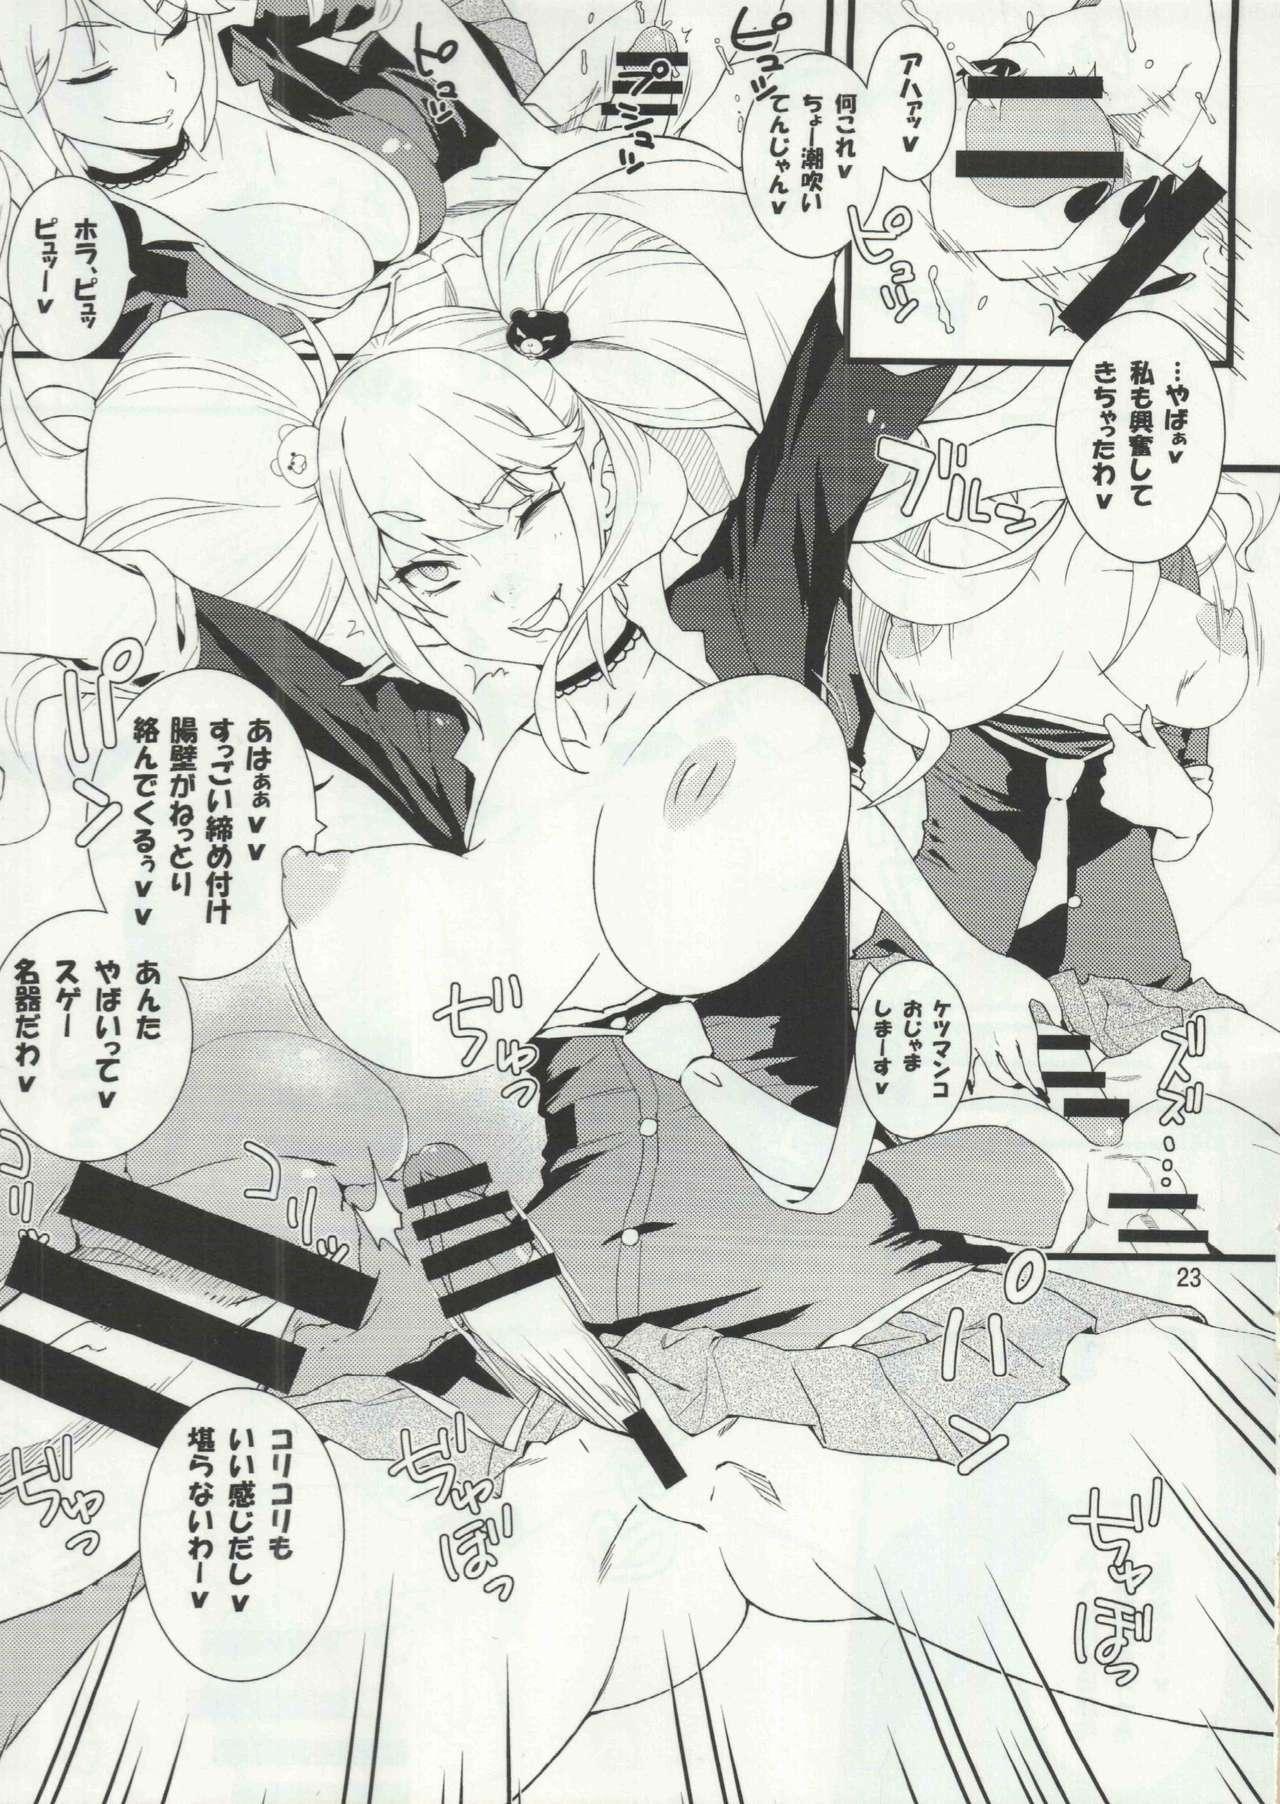 Futanari Onee-san x Otokonoko Cosplayer AV Satsuei Hen Kanzenban 21